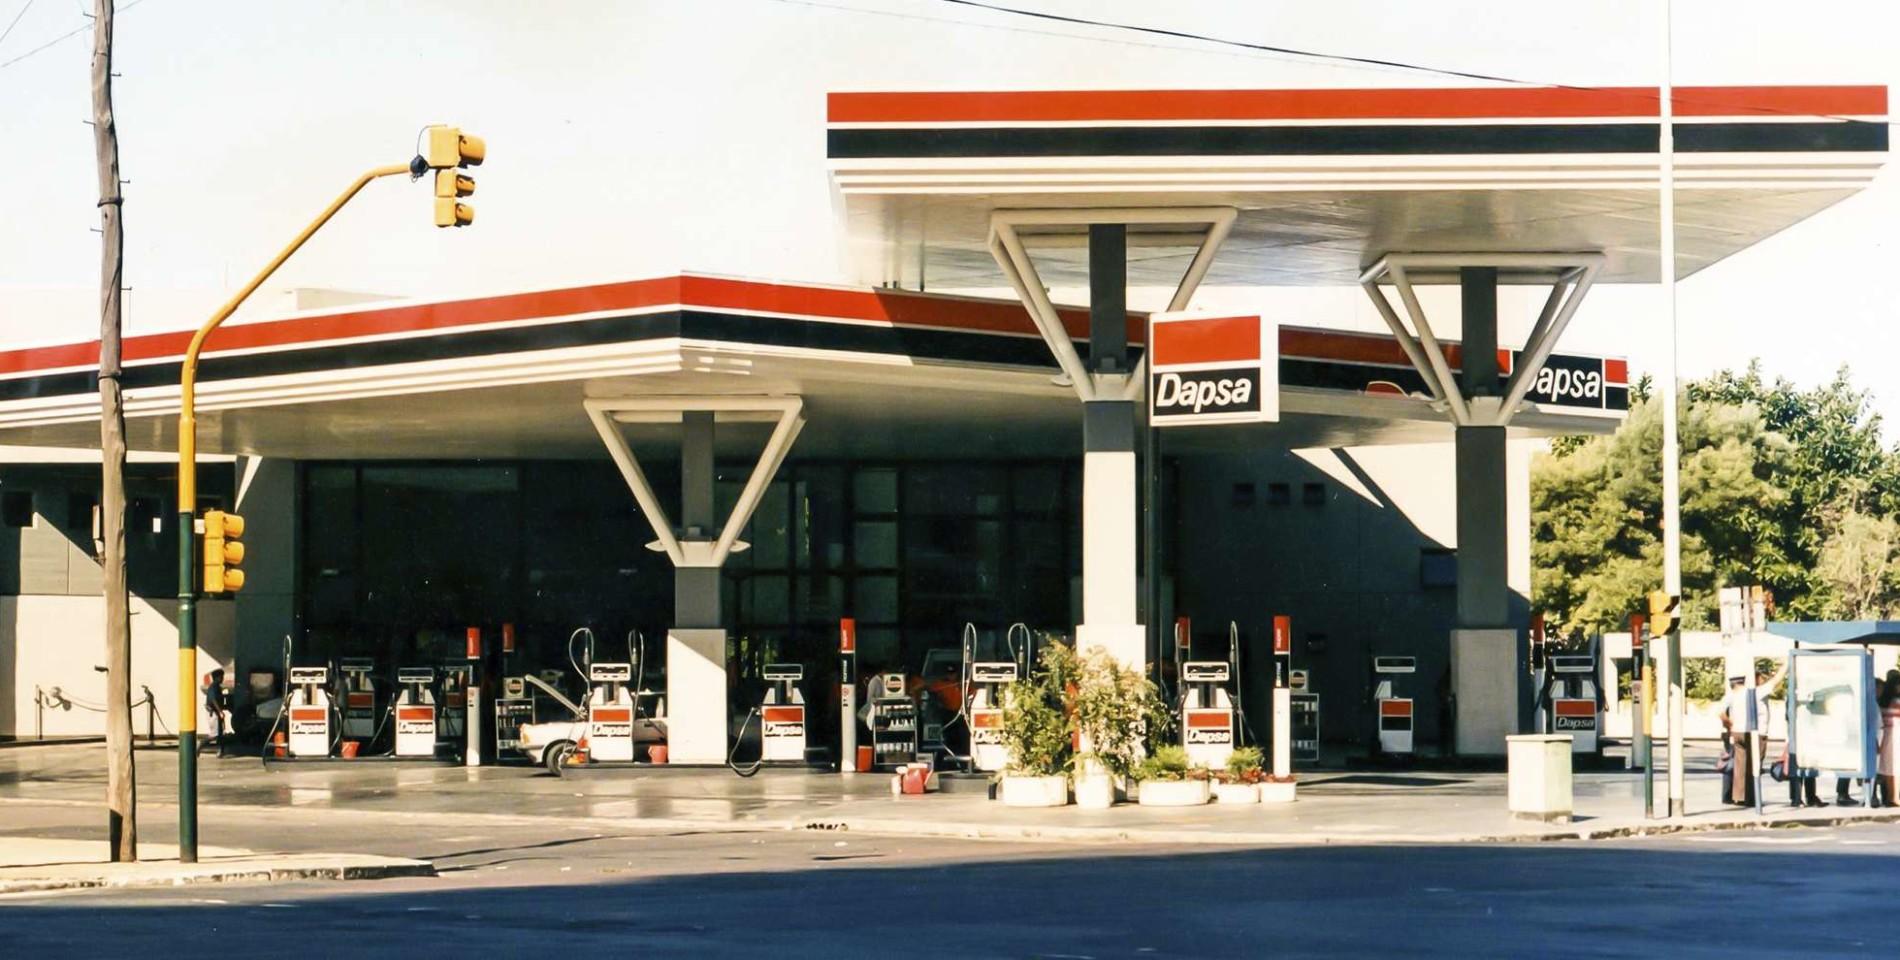 estacion-de-servicio-dapsa-figueroa-alcorta-2